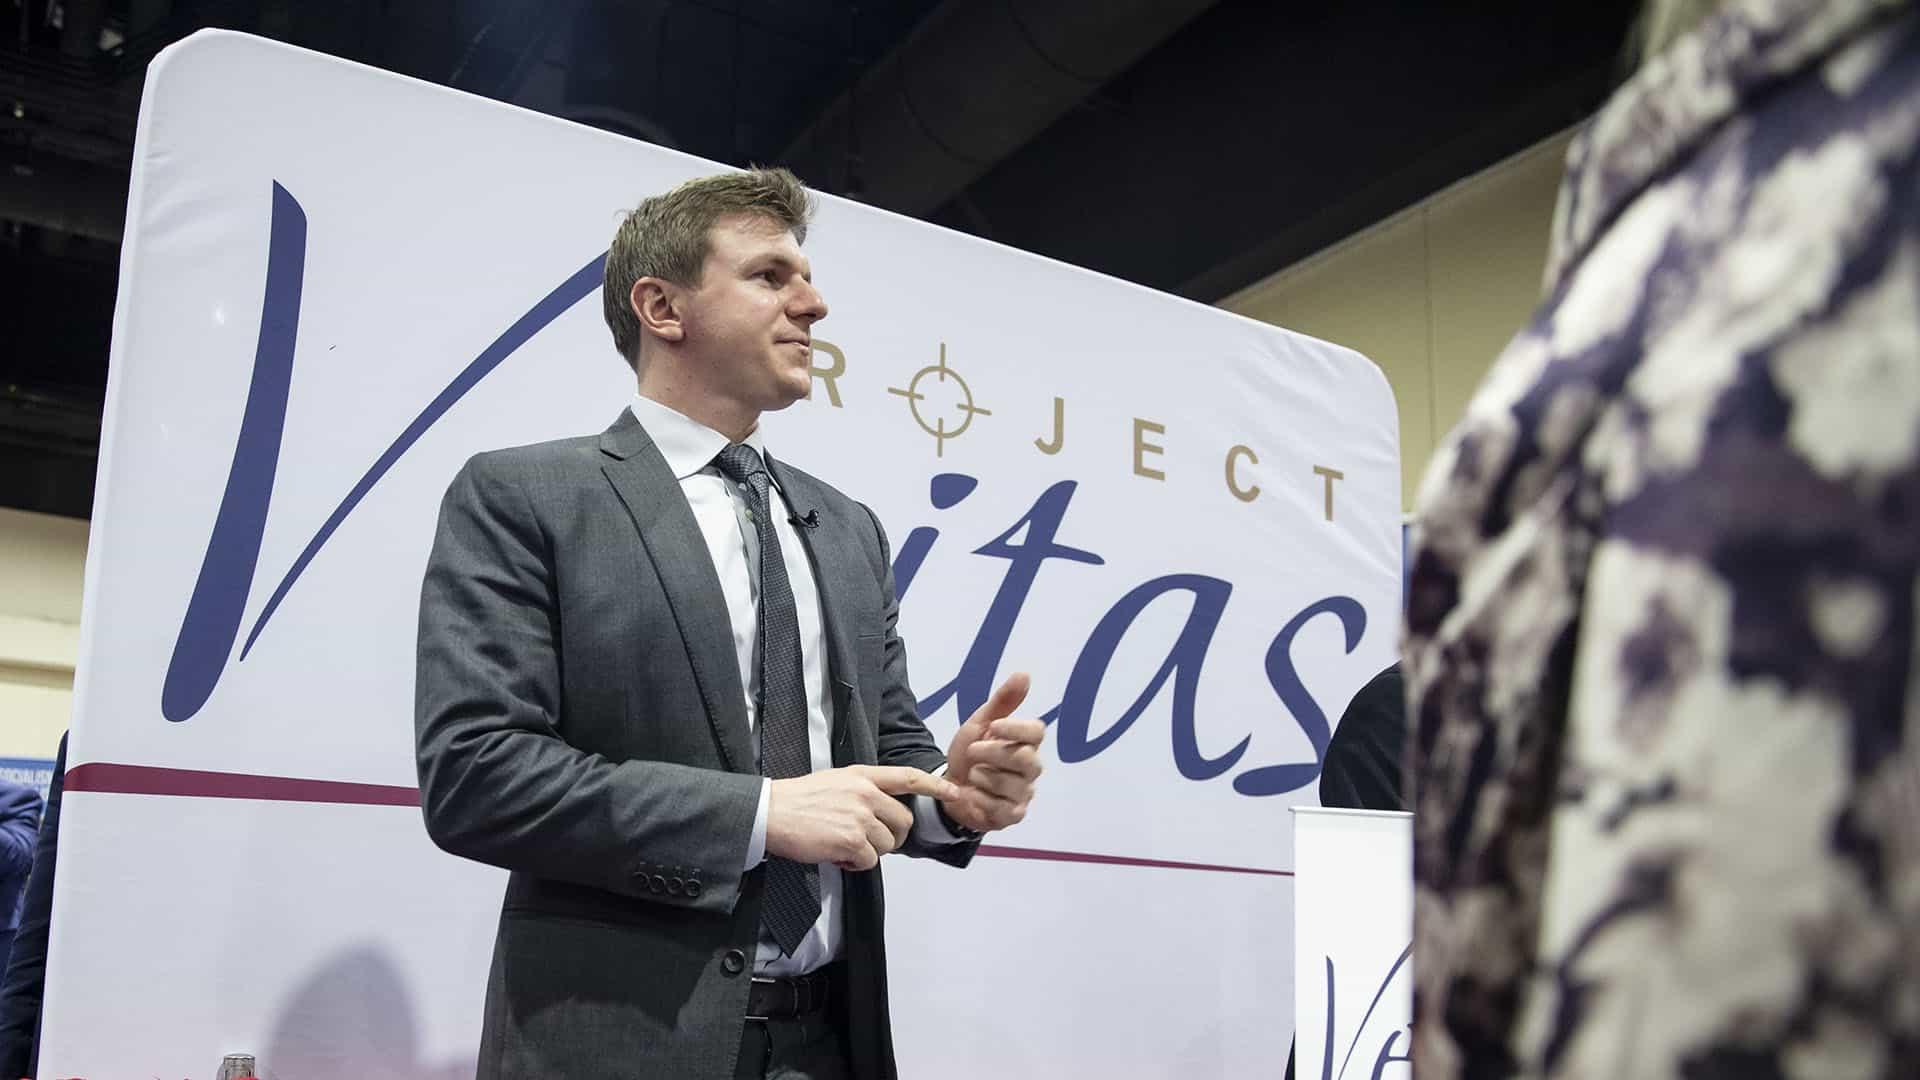 James O'Keefe - Project Veritas